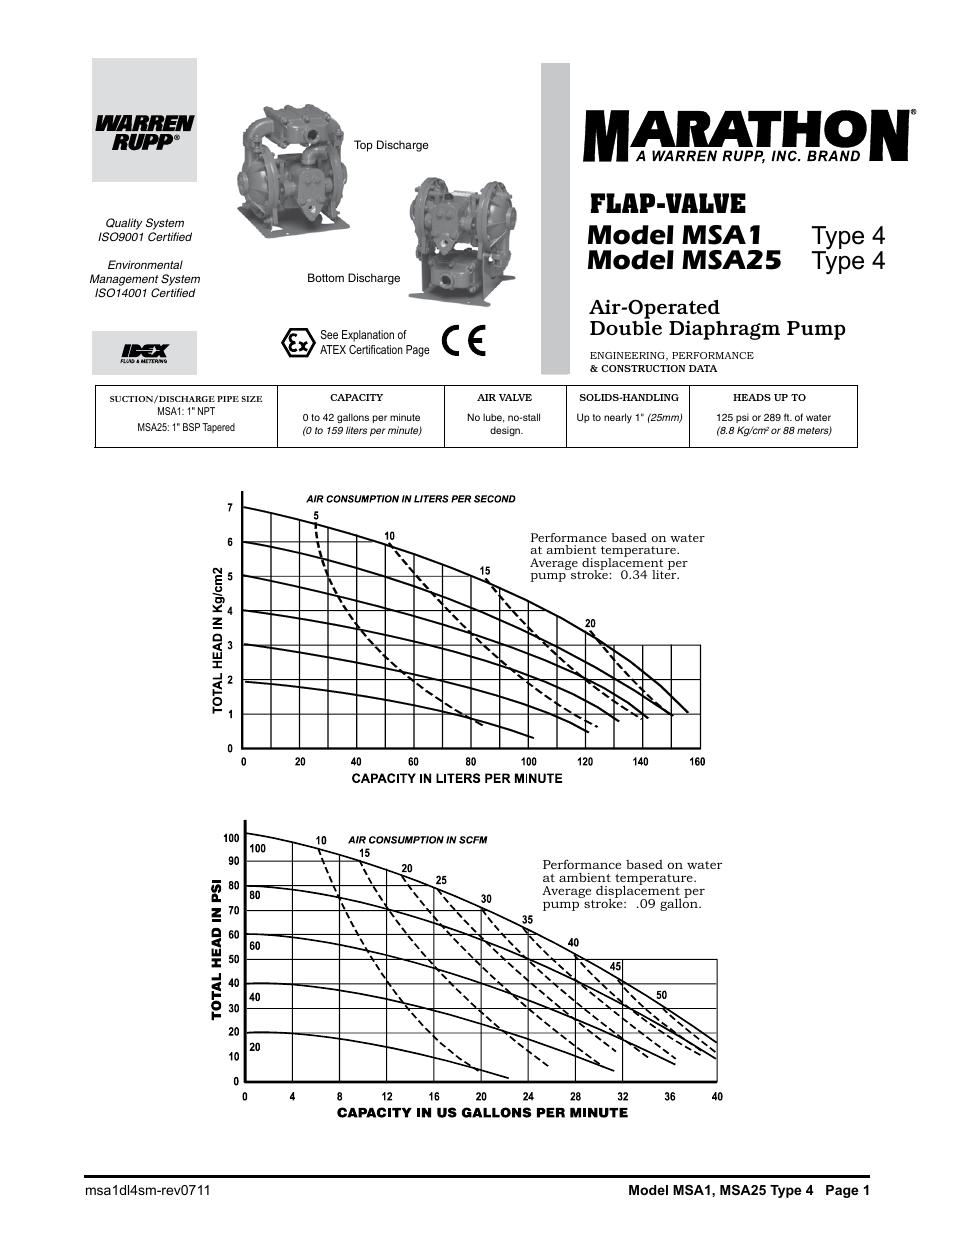 Sa25 air operated double diaphragm pump model msa1 sandpiper sa25 air operated double diaphragm pump model msa1 model msa25 type ccuart Images